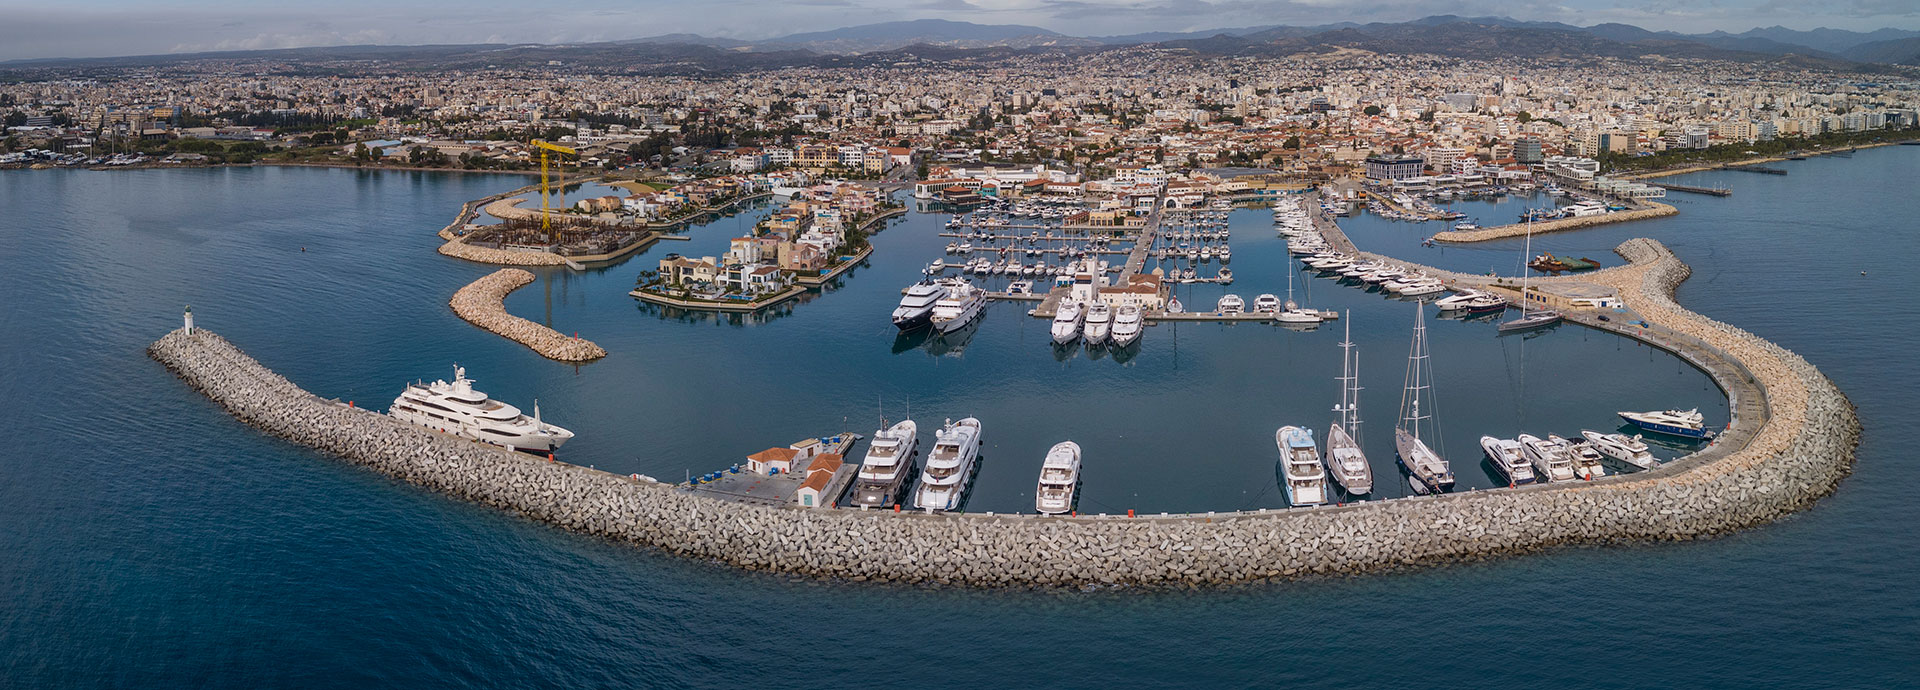 limassol port,aerial